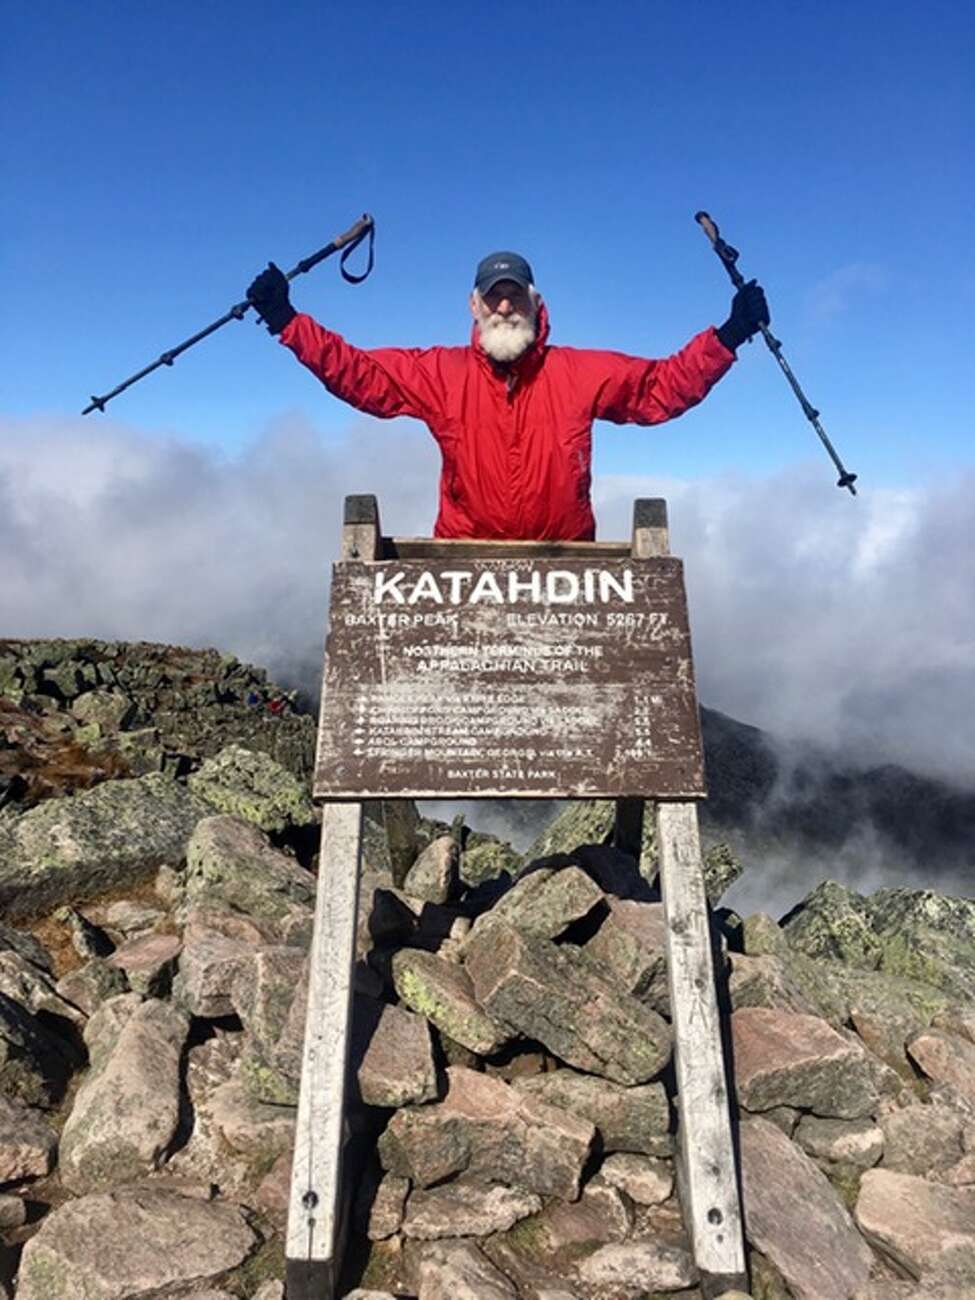 Troy resident Carl Klinowski, whose trail name was